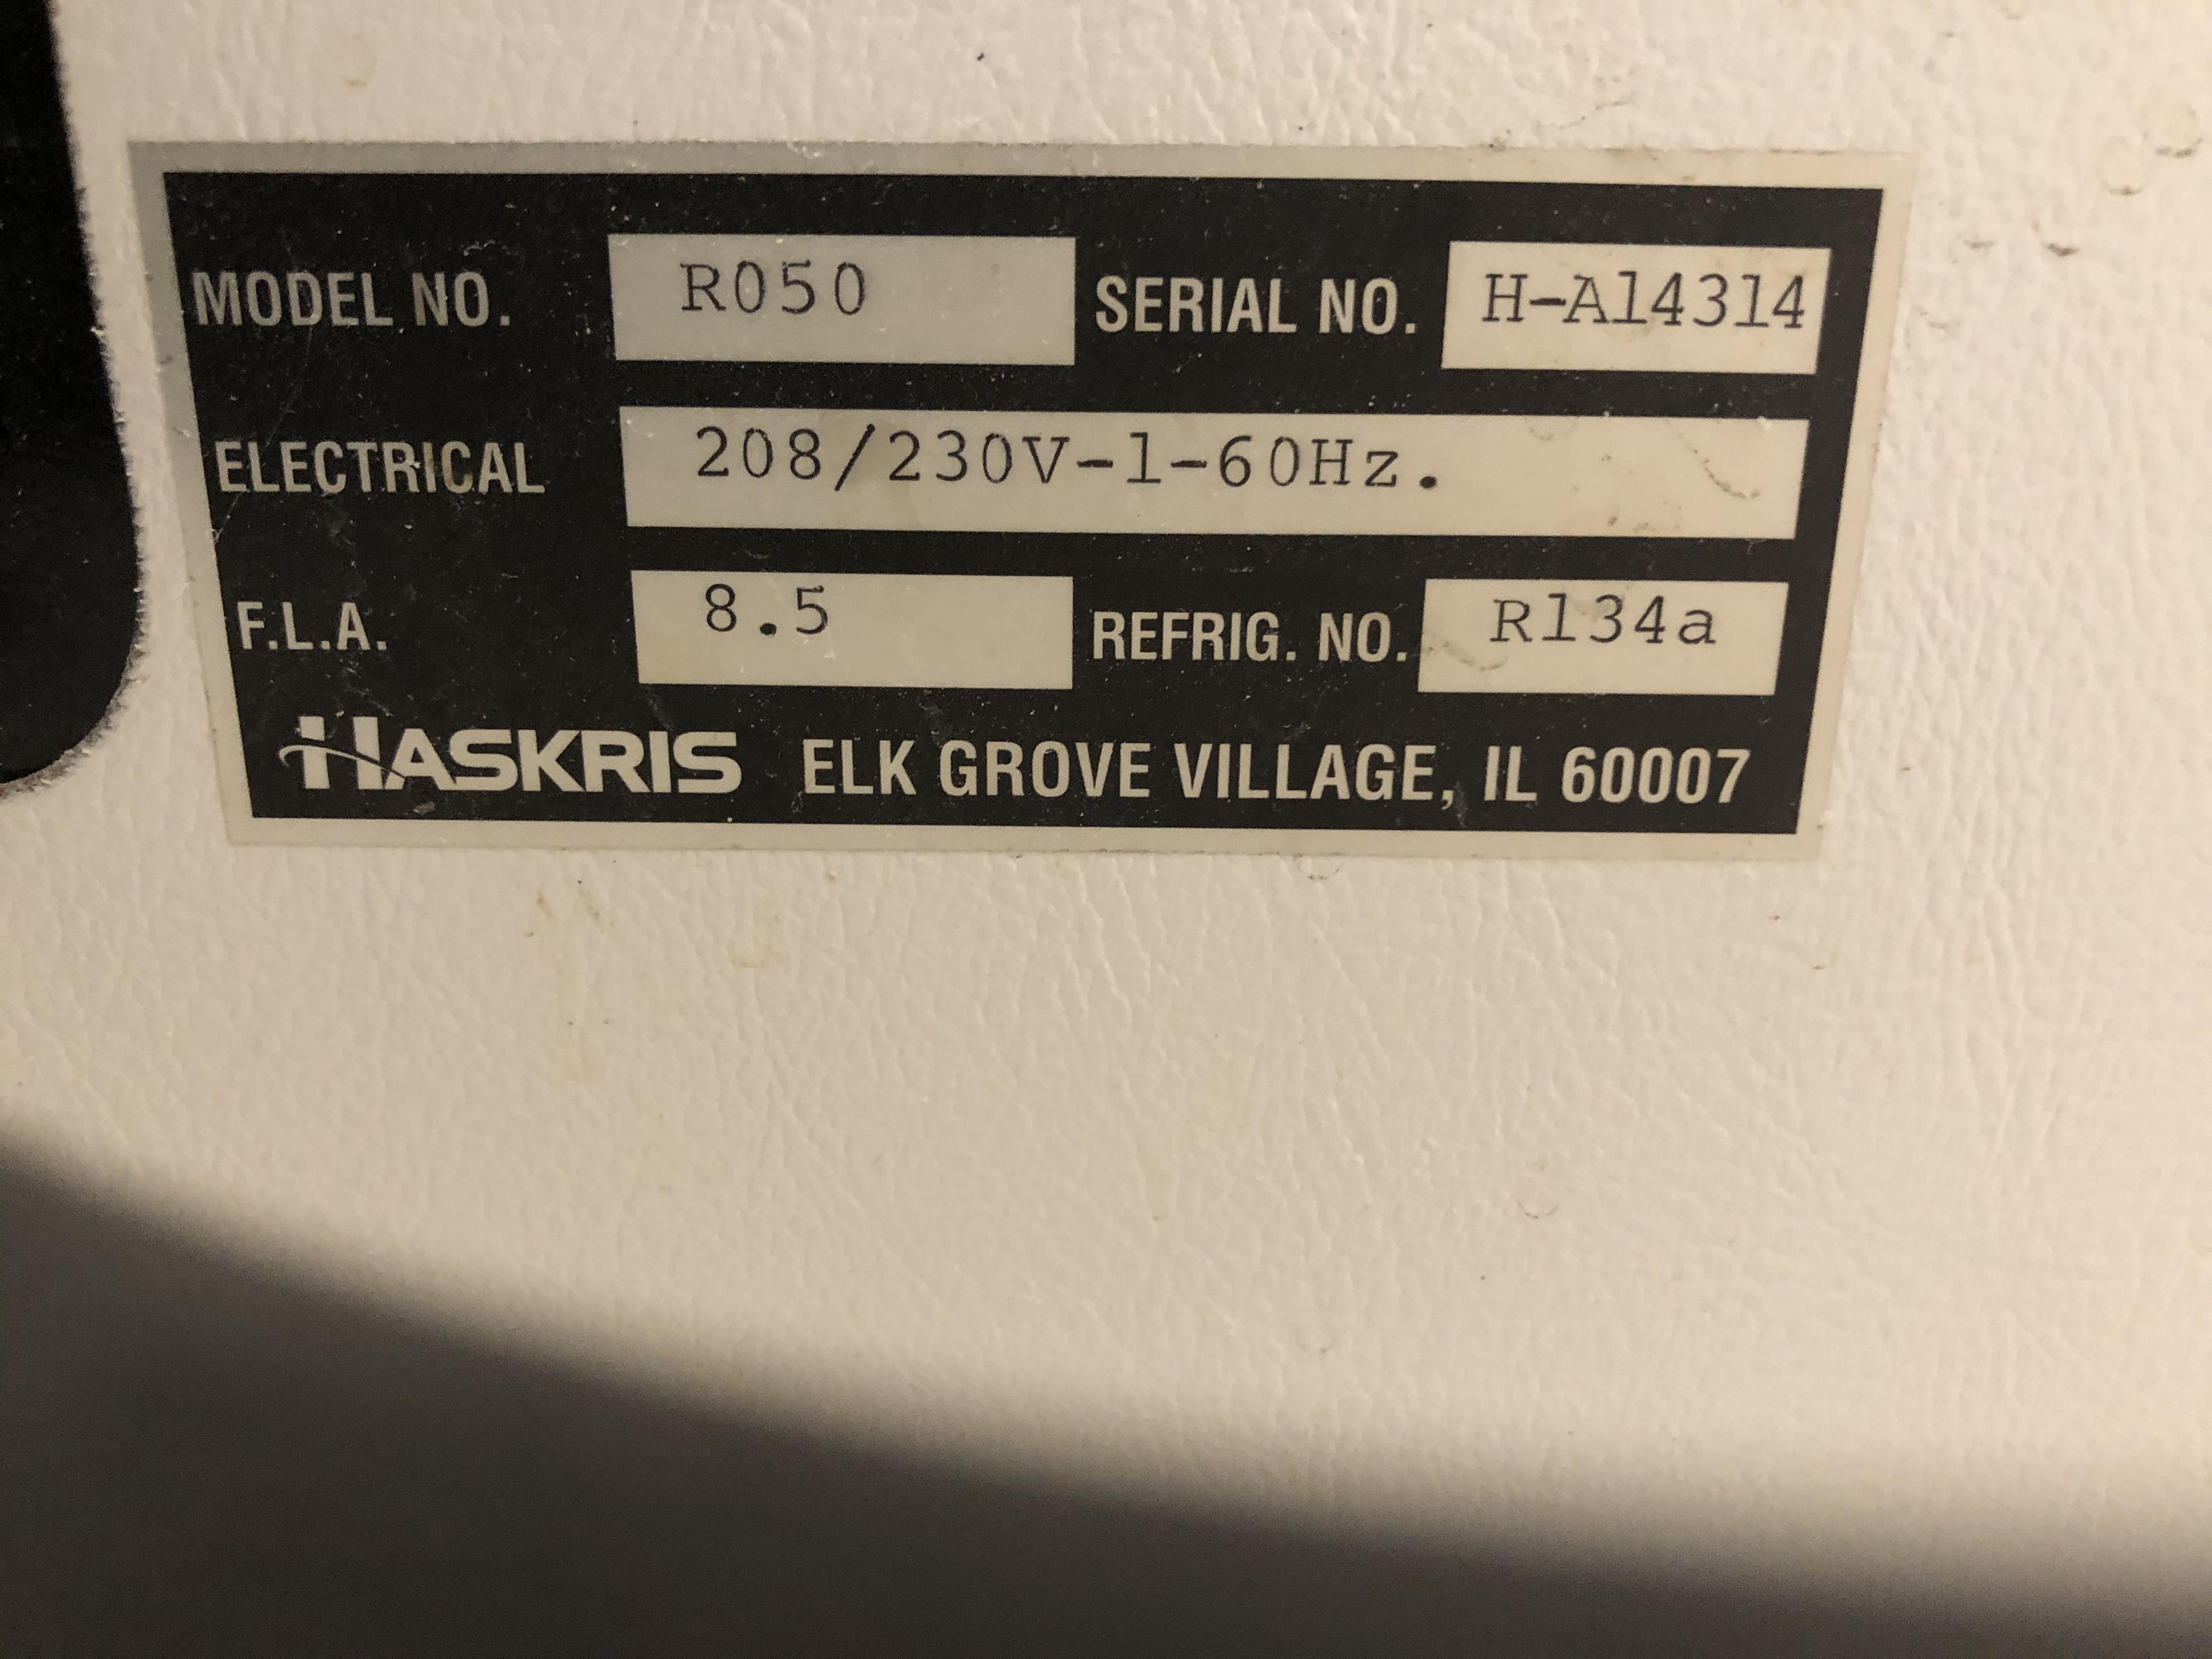 Haskris Chiller, Model# R050, Serial# H-A14314, 208/230V - Image 2 of 3